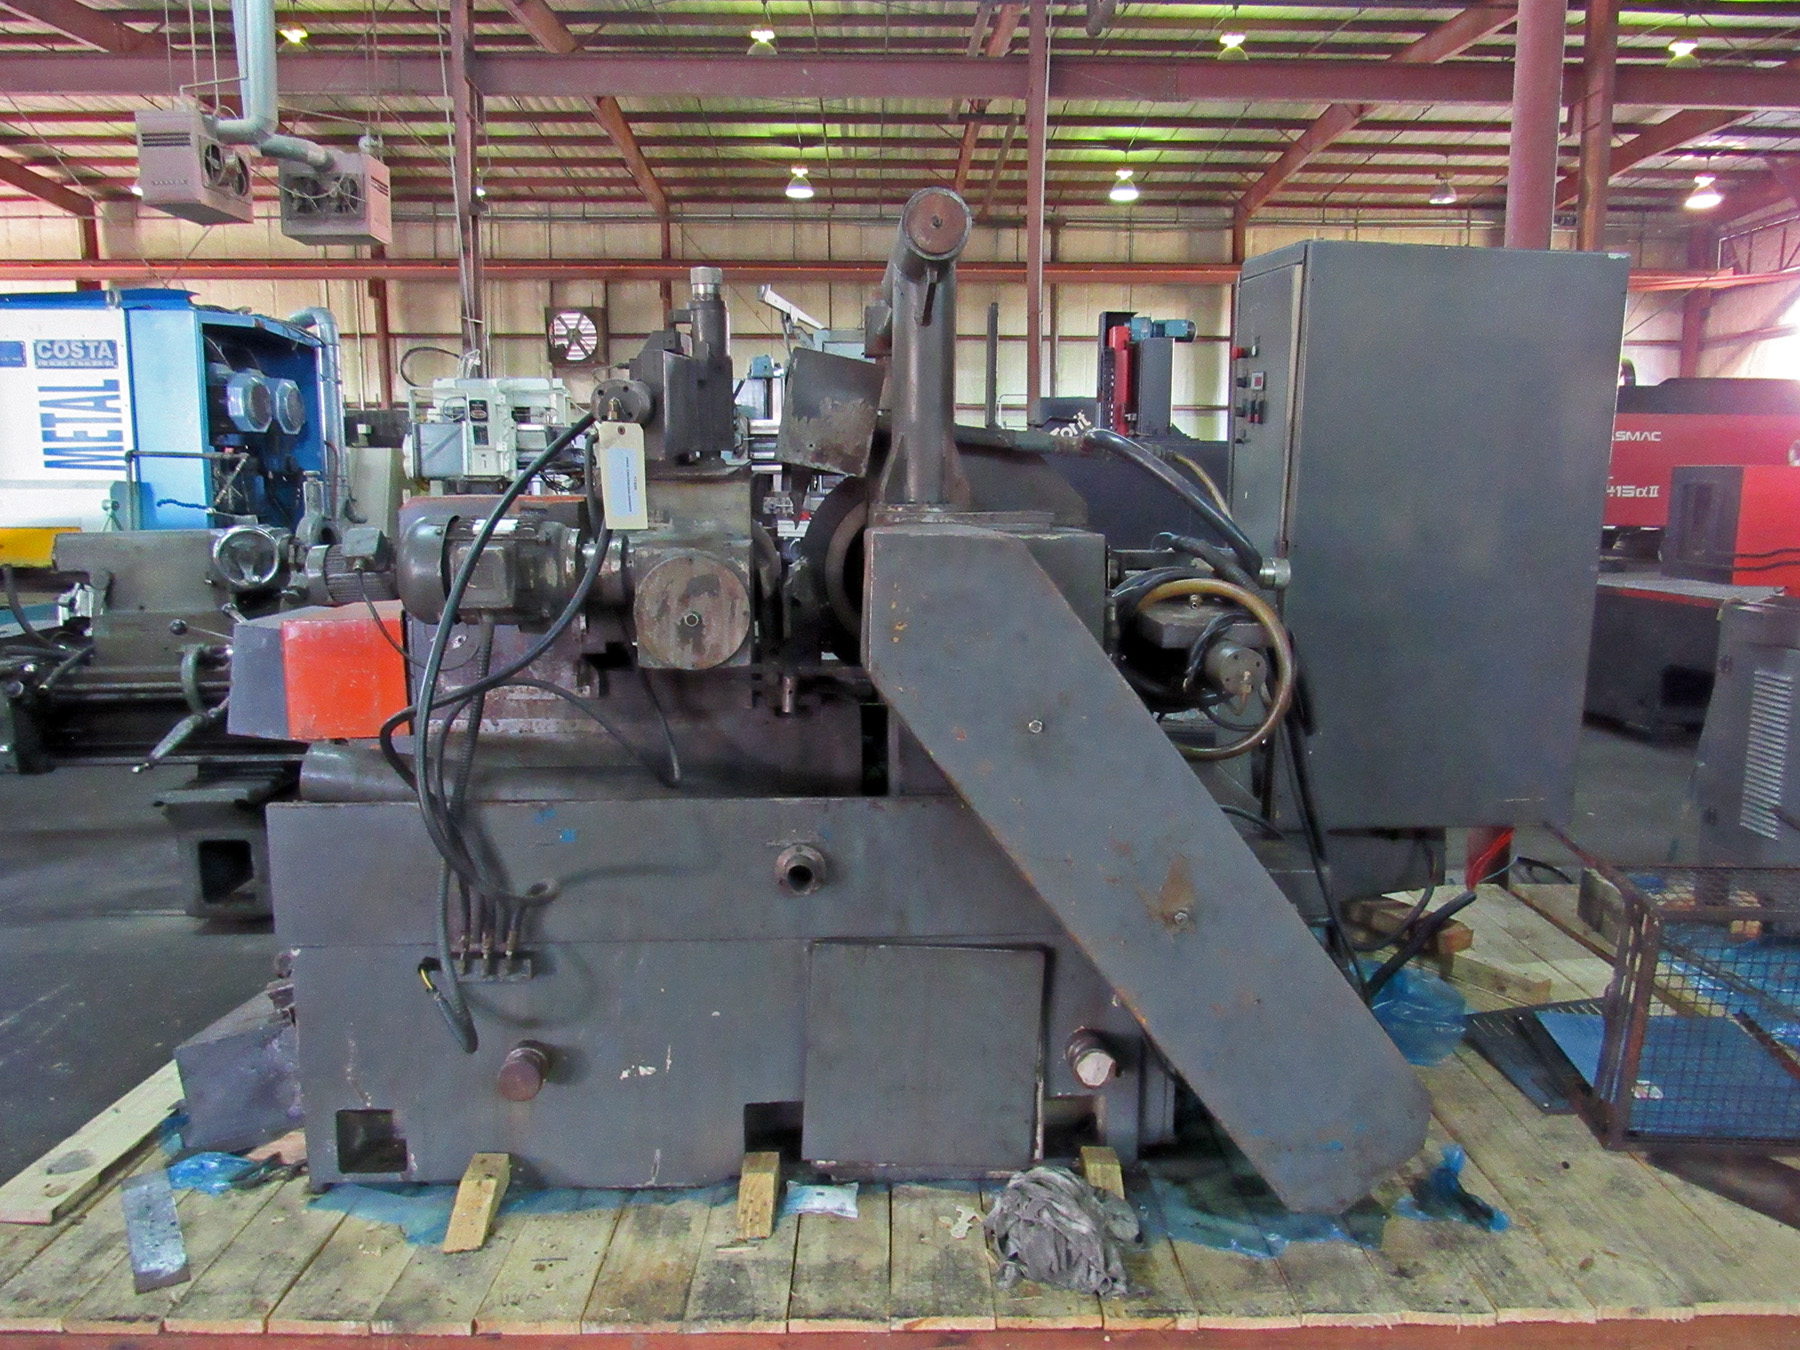 "Lot 36 - BONELI 3"" CENTERLESS GRINDER, 20"" dia. x 10""W. grinding wheel, 20 HP grinding wheel motor, 14"" x 10"""